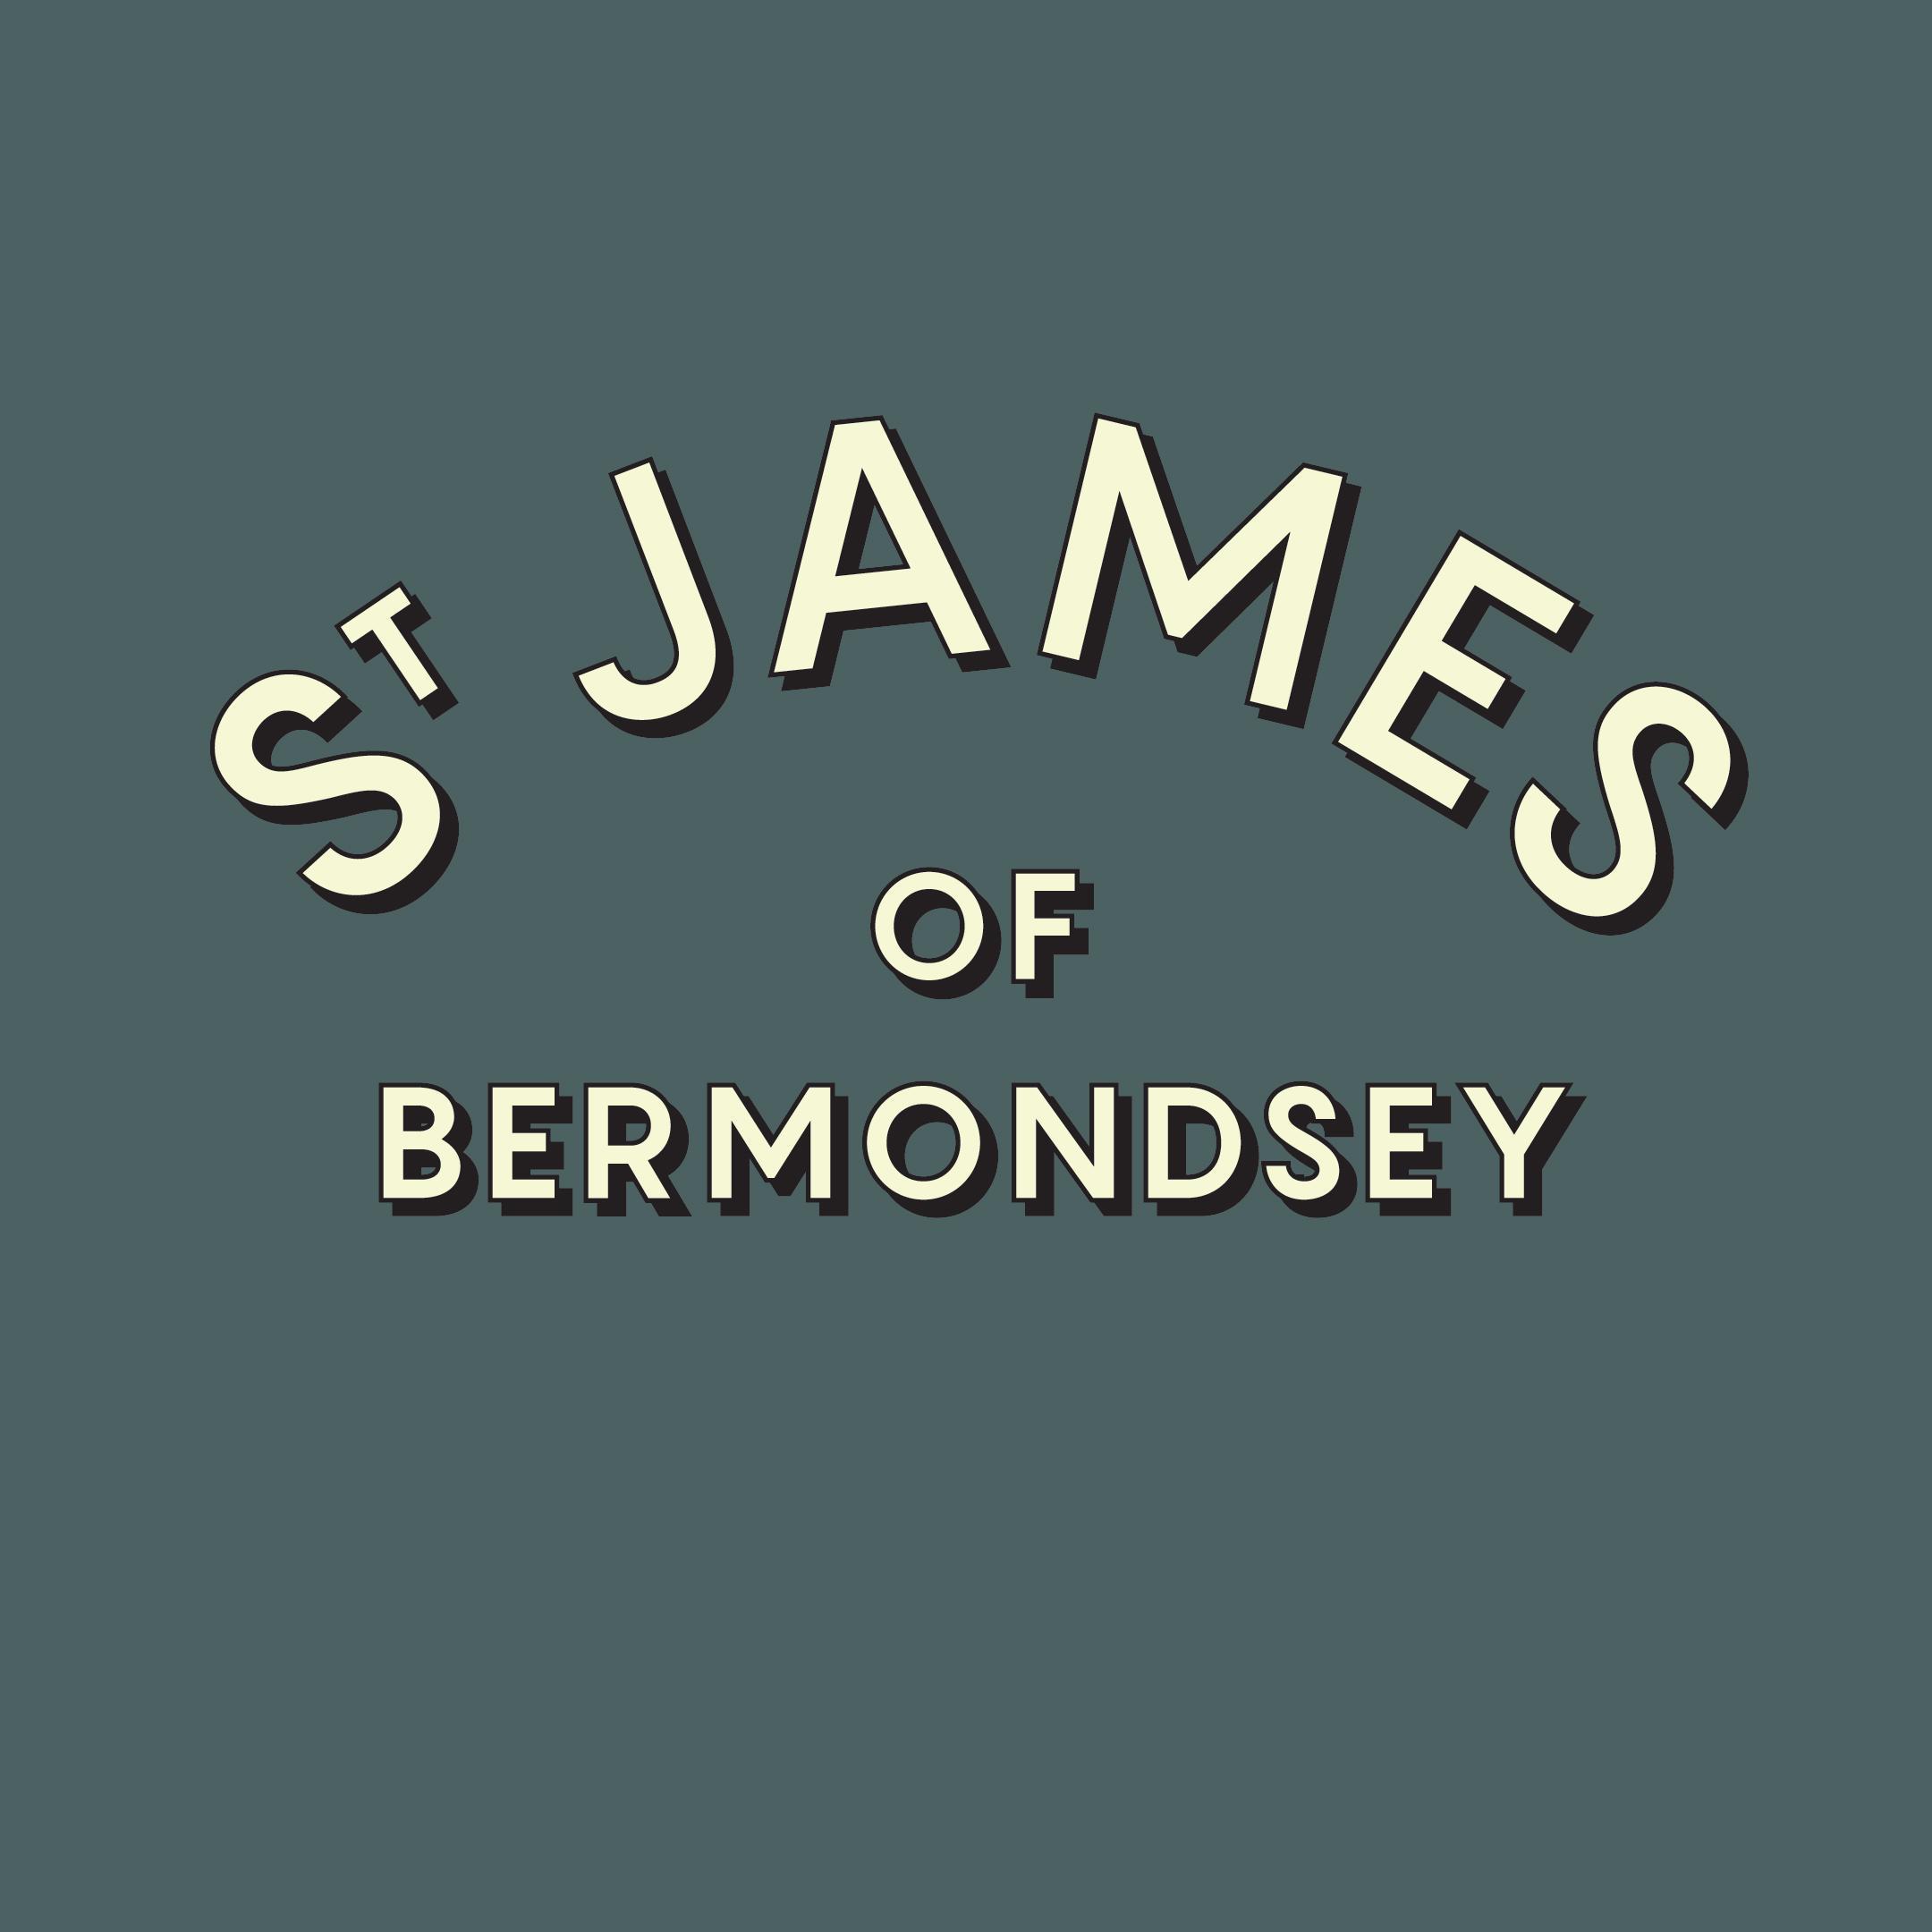 St James of Bermondsey - London, London SE16 4QZ - 020 7232 2429 | ShowMeLocal.com